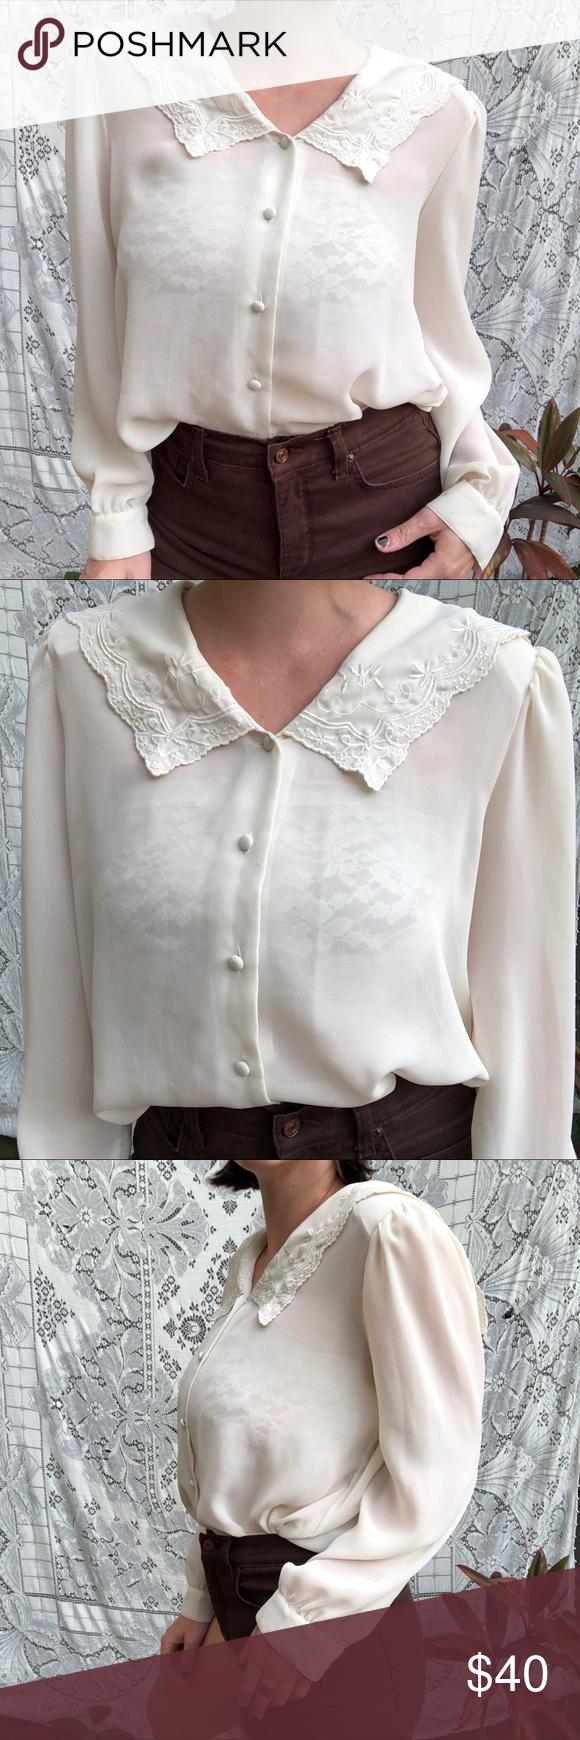 c71fc5eb Vintage | 80's cream lace collar blouse This vintage 80's lace collar blouse  has me swooning